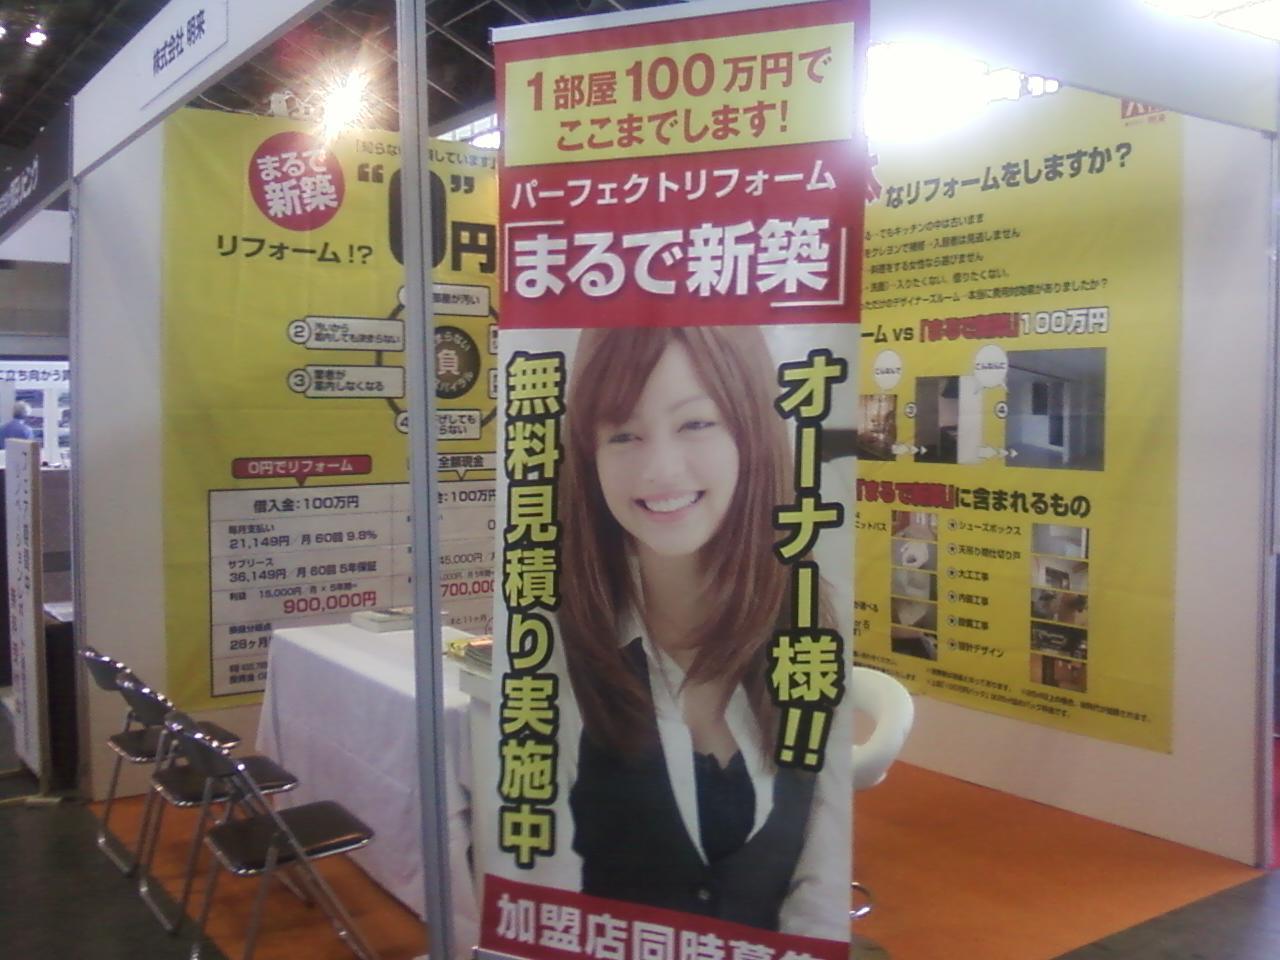 名古屋賃貸住宅フェアー_d0106237_1624917.jpg